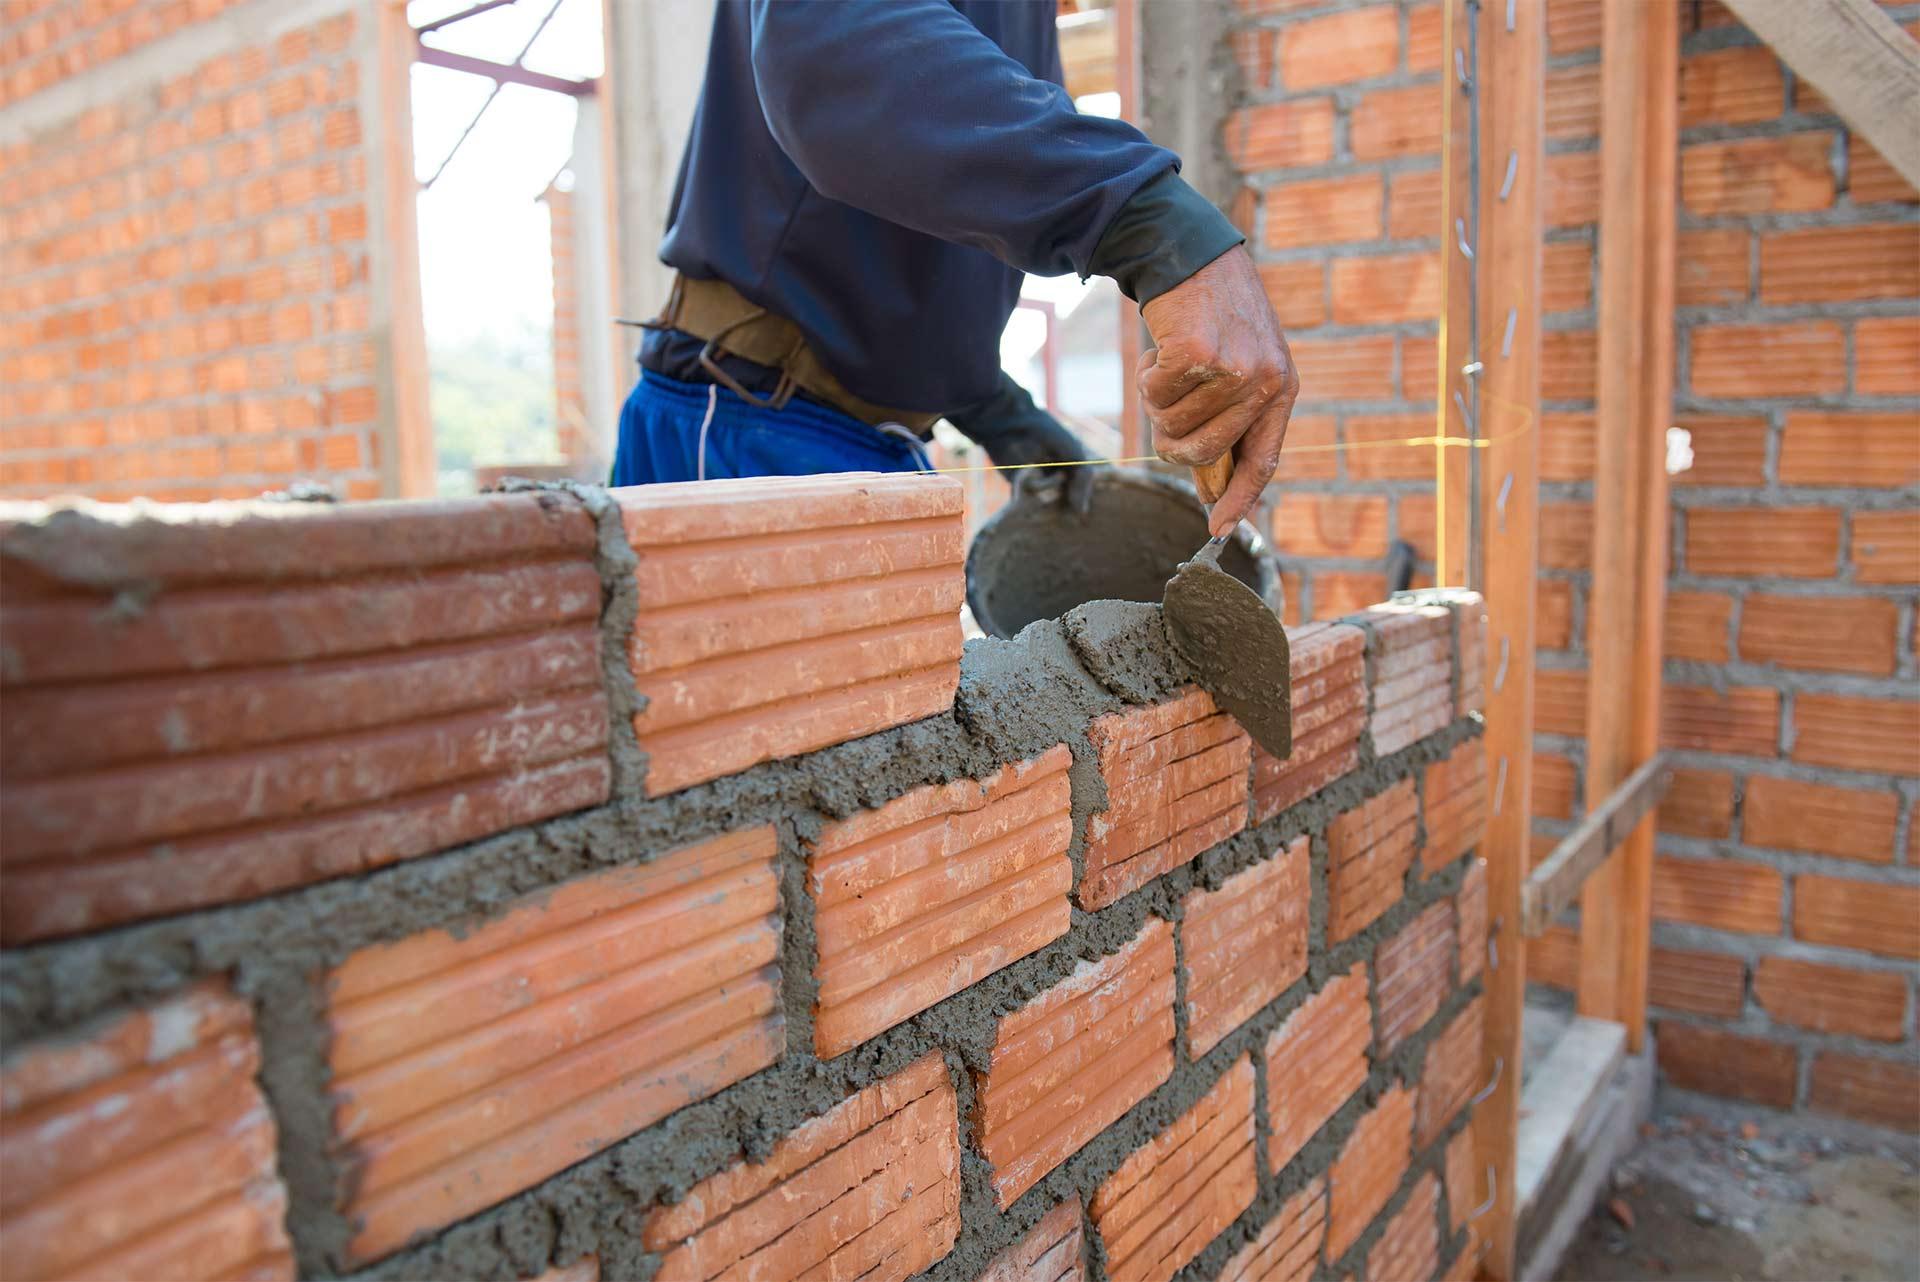 bricklayers in Surrey & Merton Borough